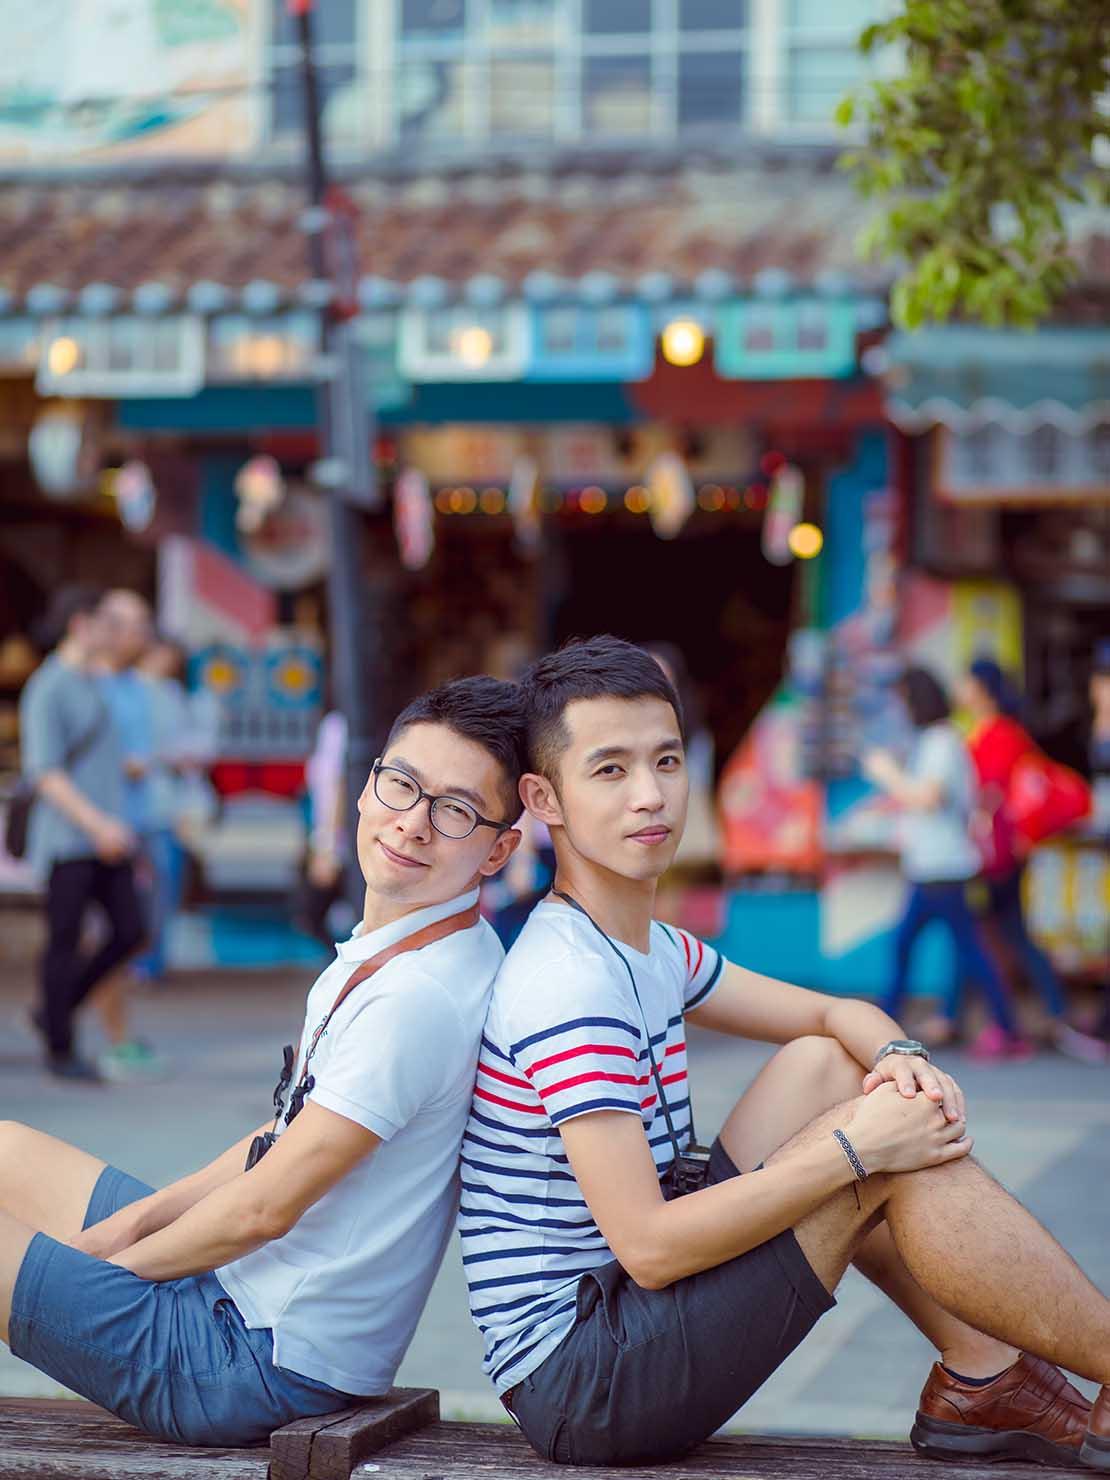 KKday台湾旅行・出張撮影サービス撮影サンプル(淡水老街に座る2人)